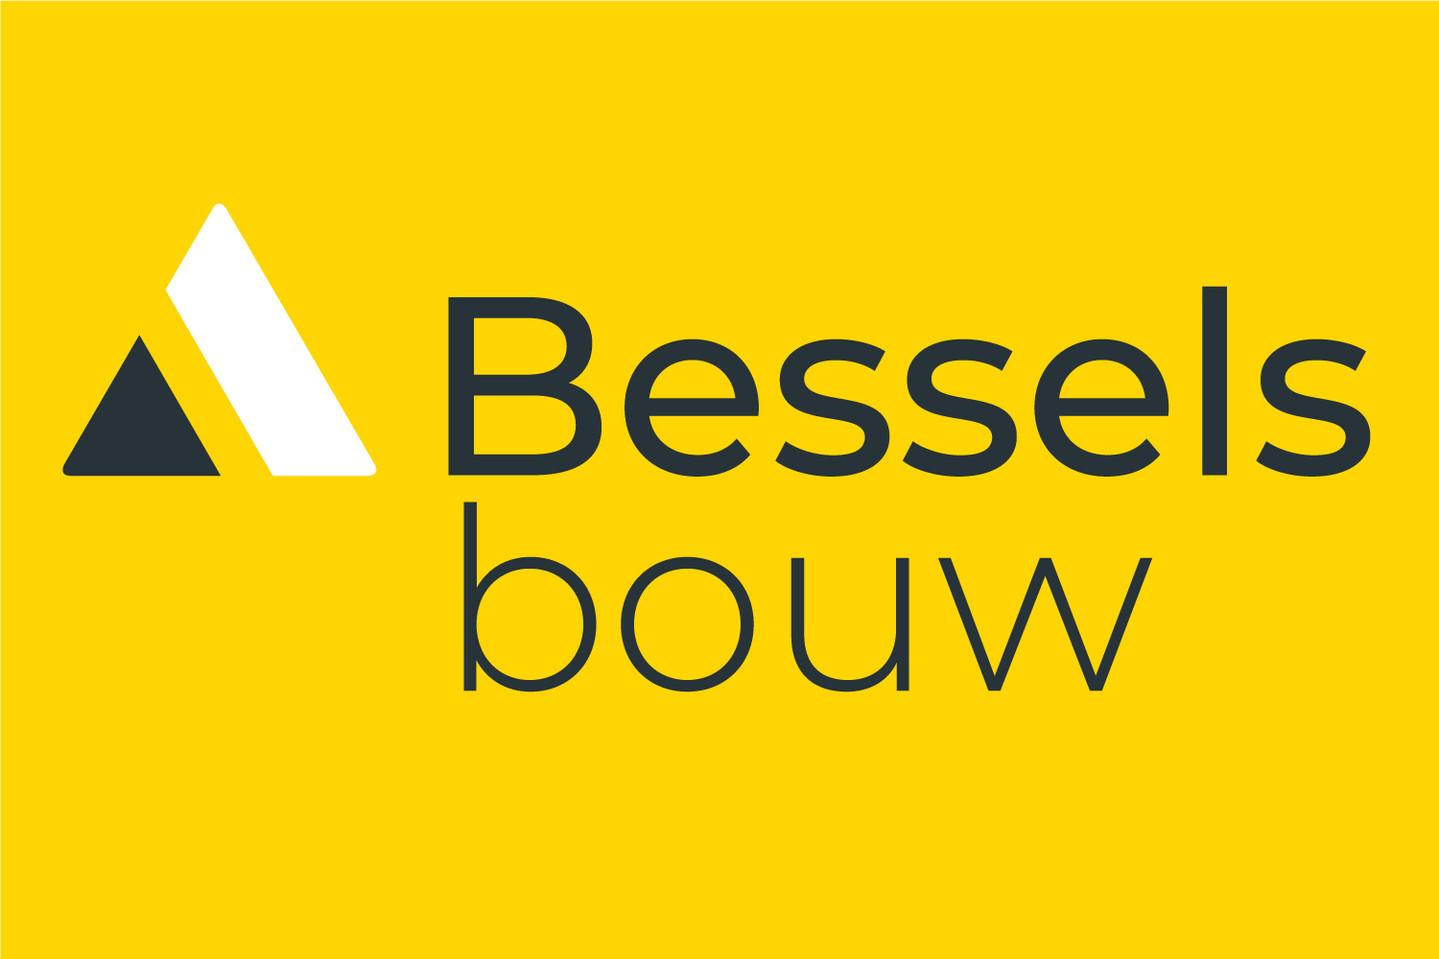 Bessels bouw